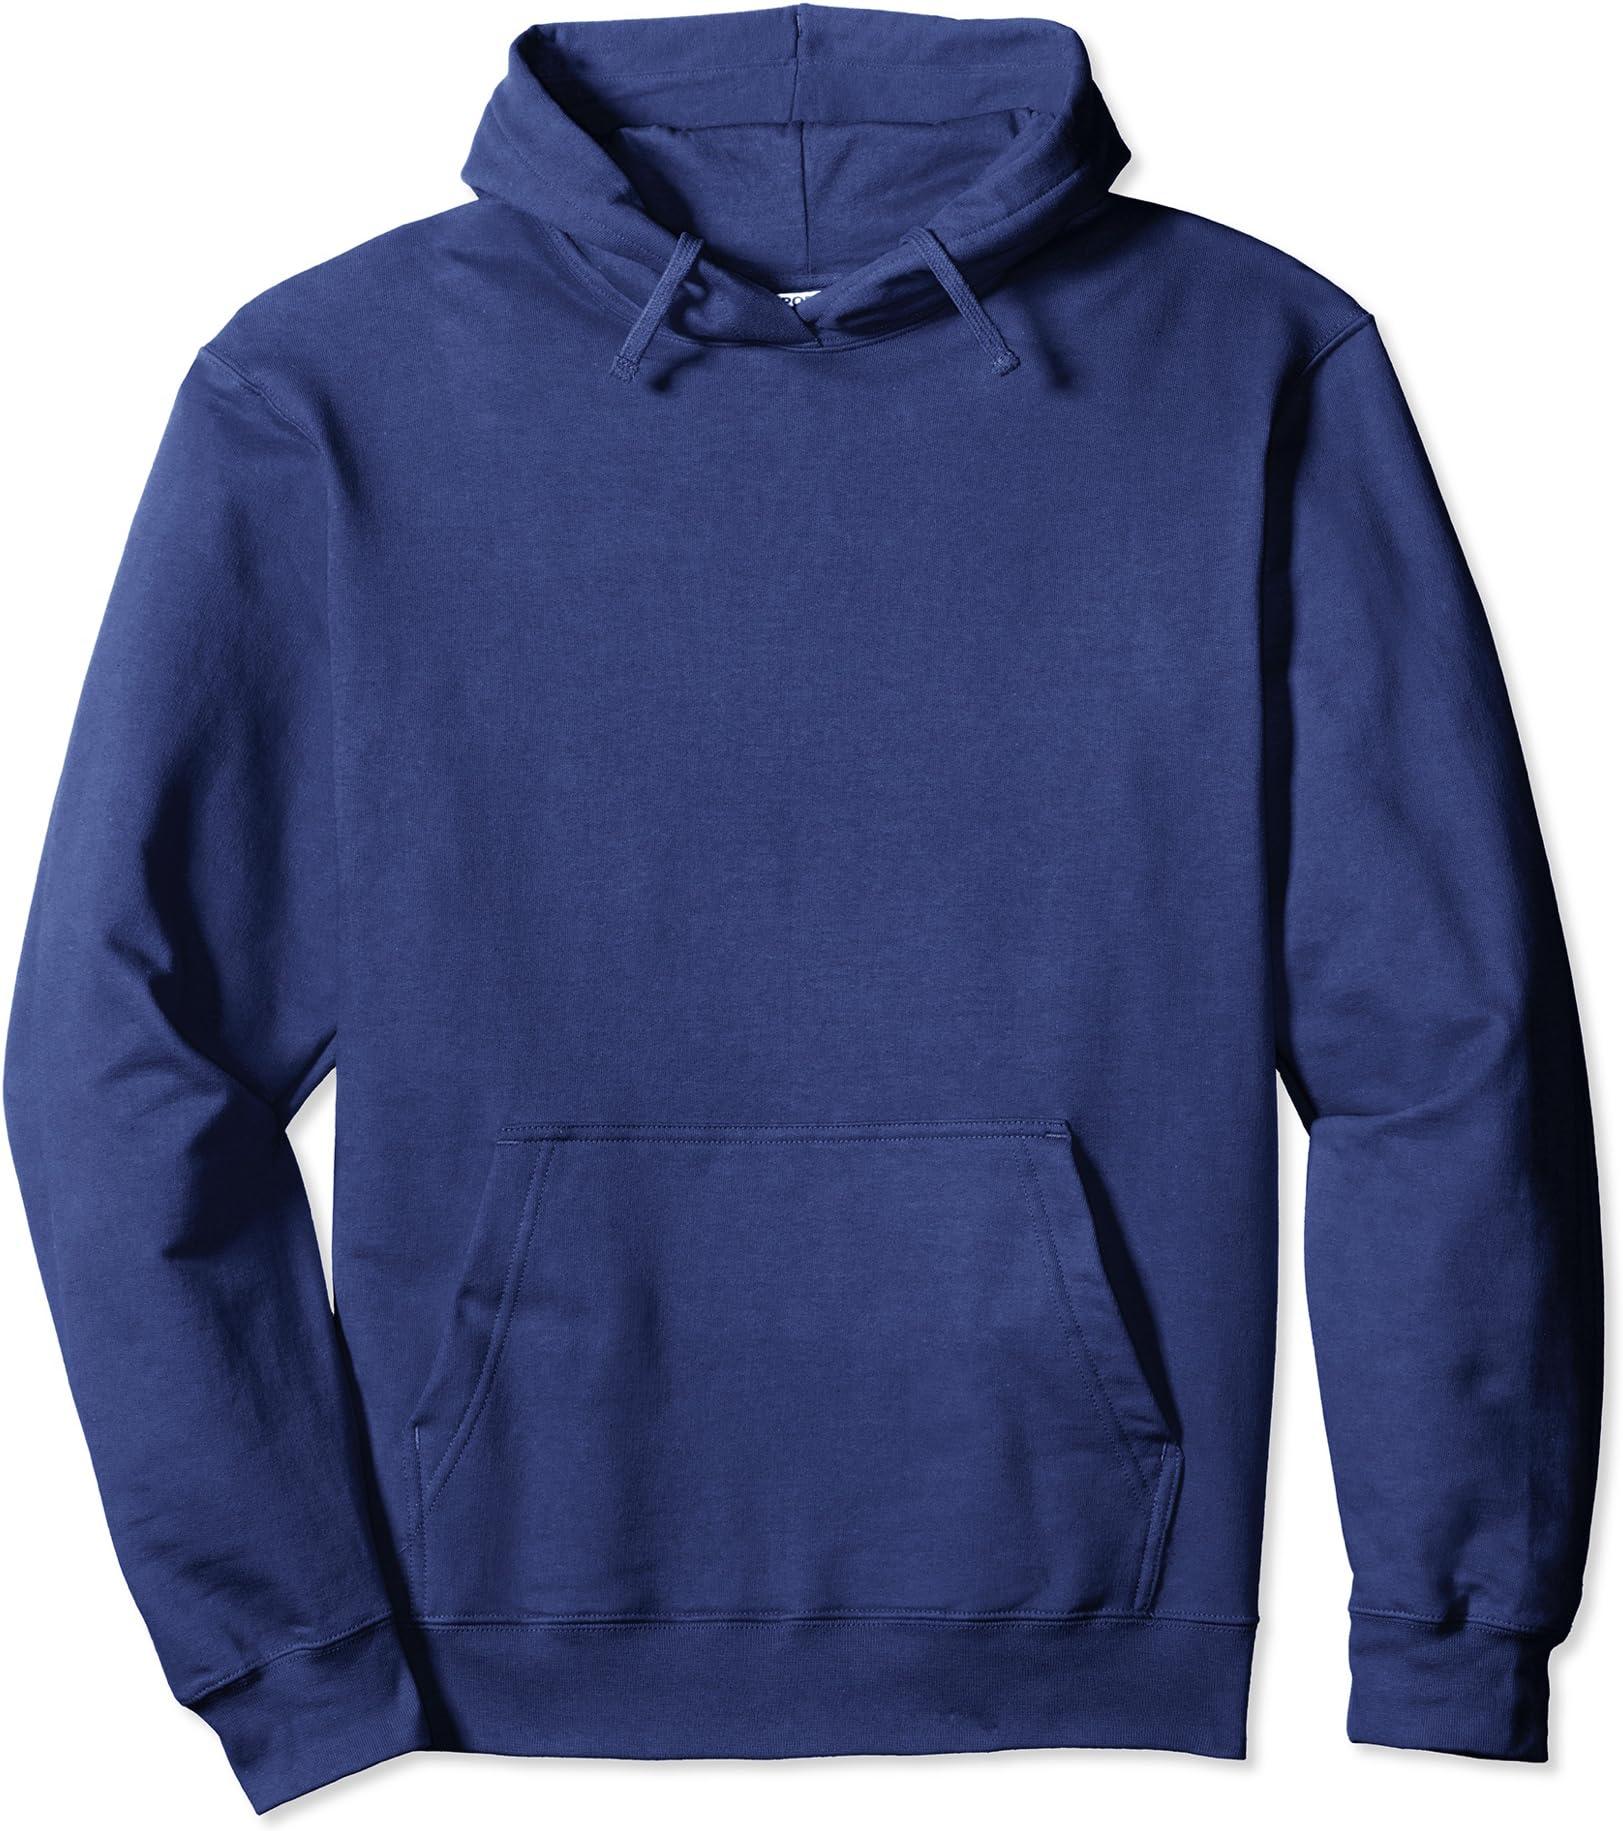 Love Dogs Paw Print Boys Girls Kids Childrens Jumper Sweatshirt